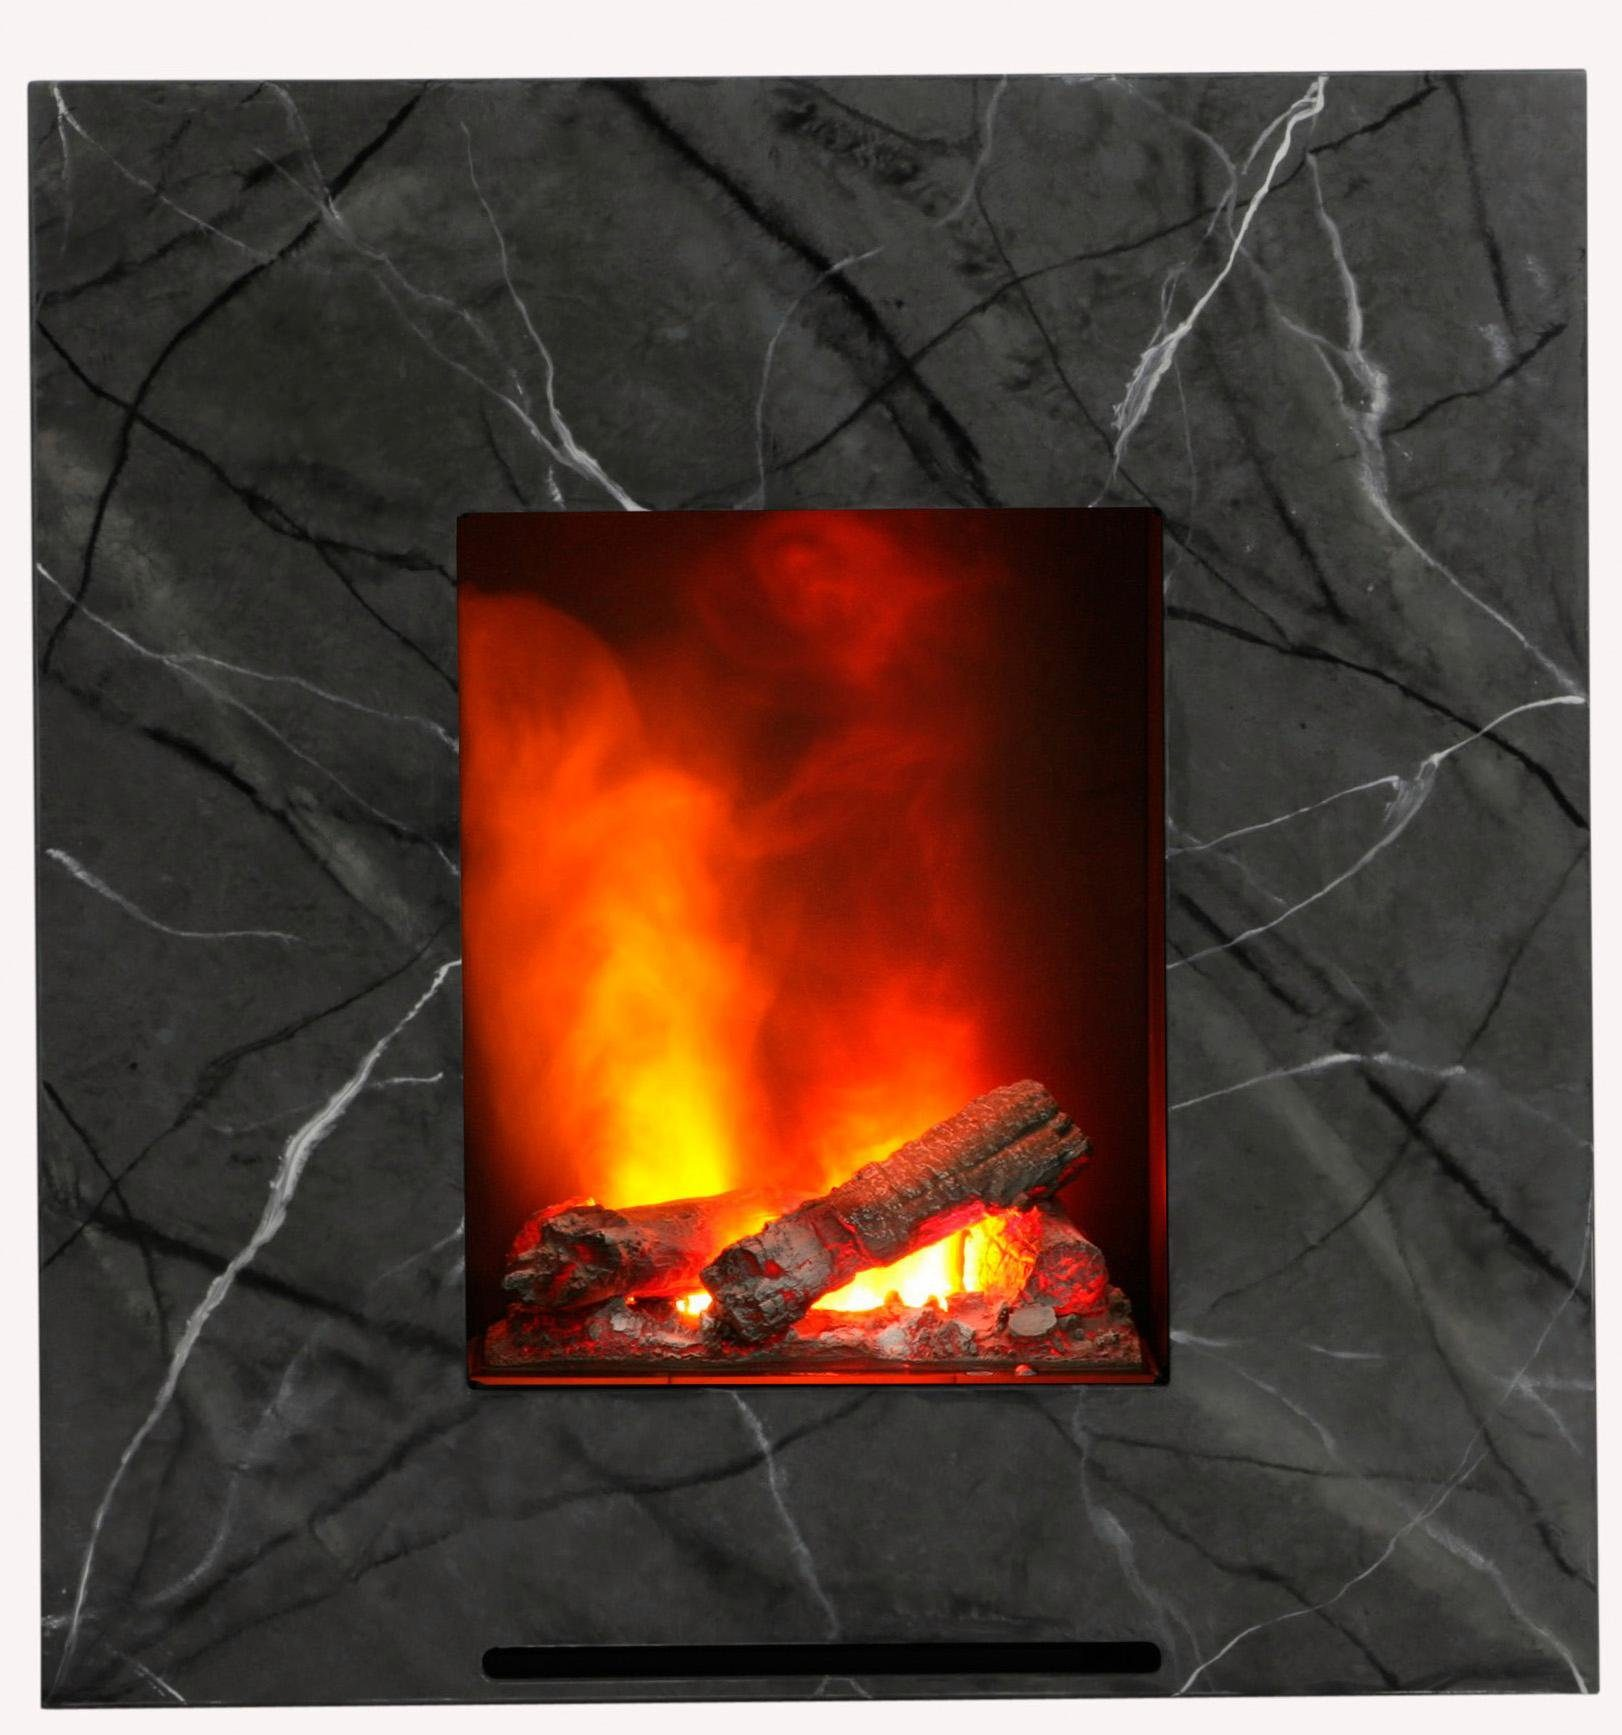 albero® Elektrokamin, marmoriert, mit dreidimensionalem Flammeffekt, »Eaton«